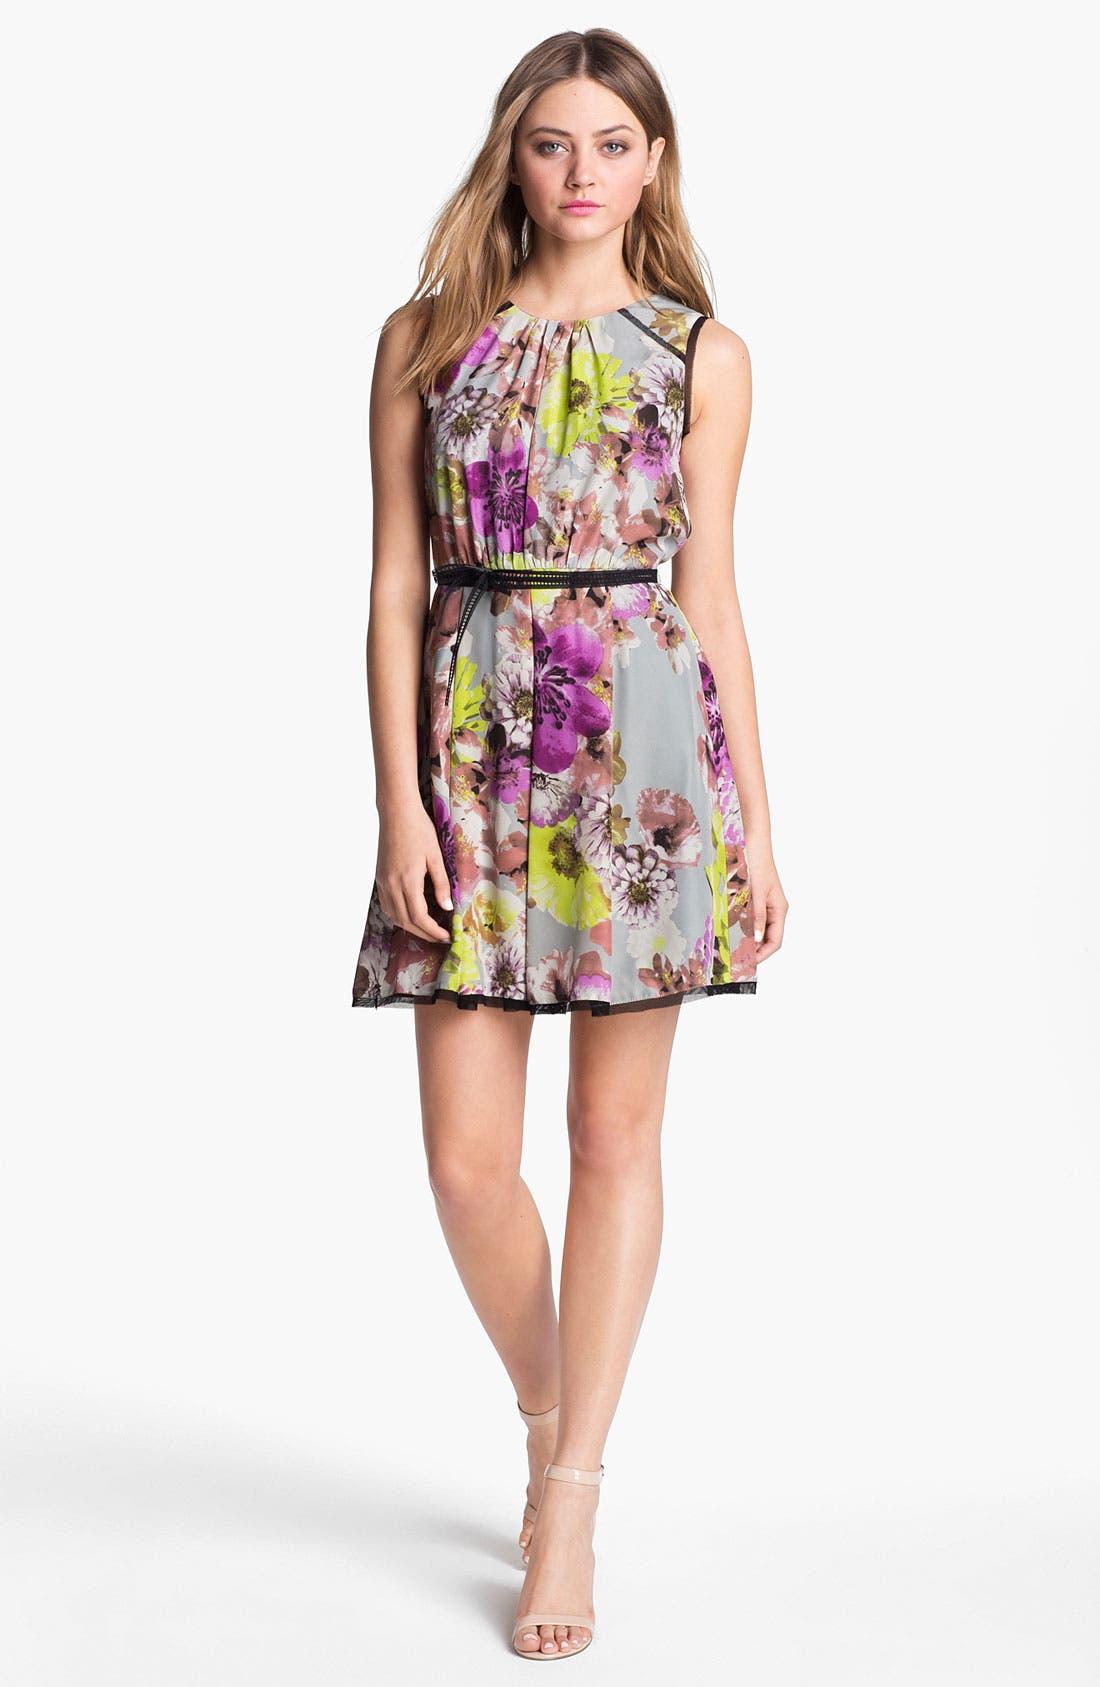 Main Image - LABEL by five twelve Floral Print Fit & Flare Dress